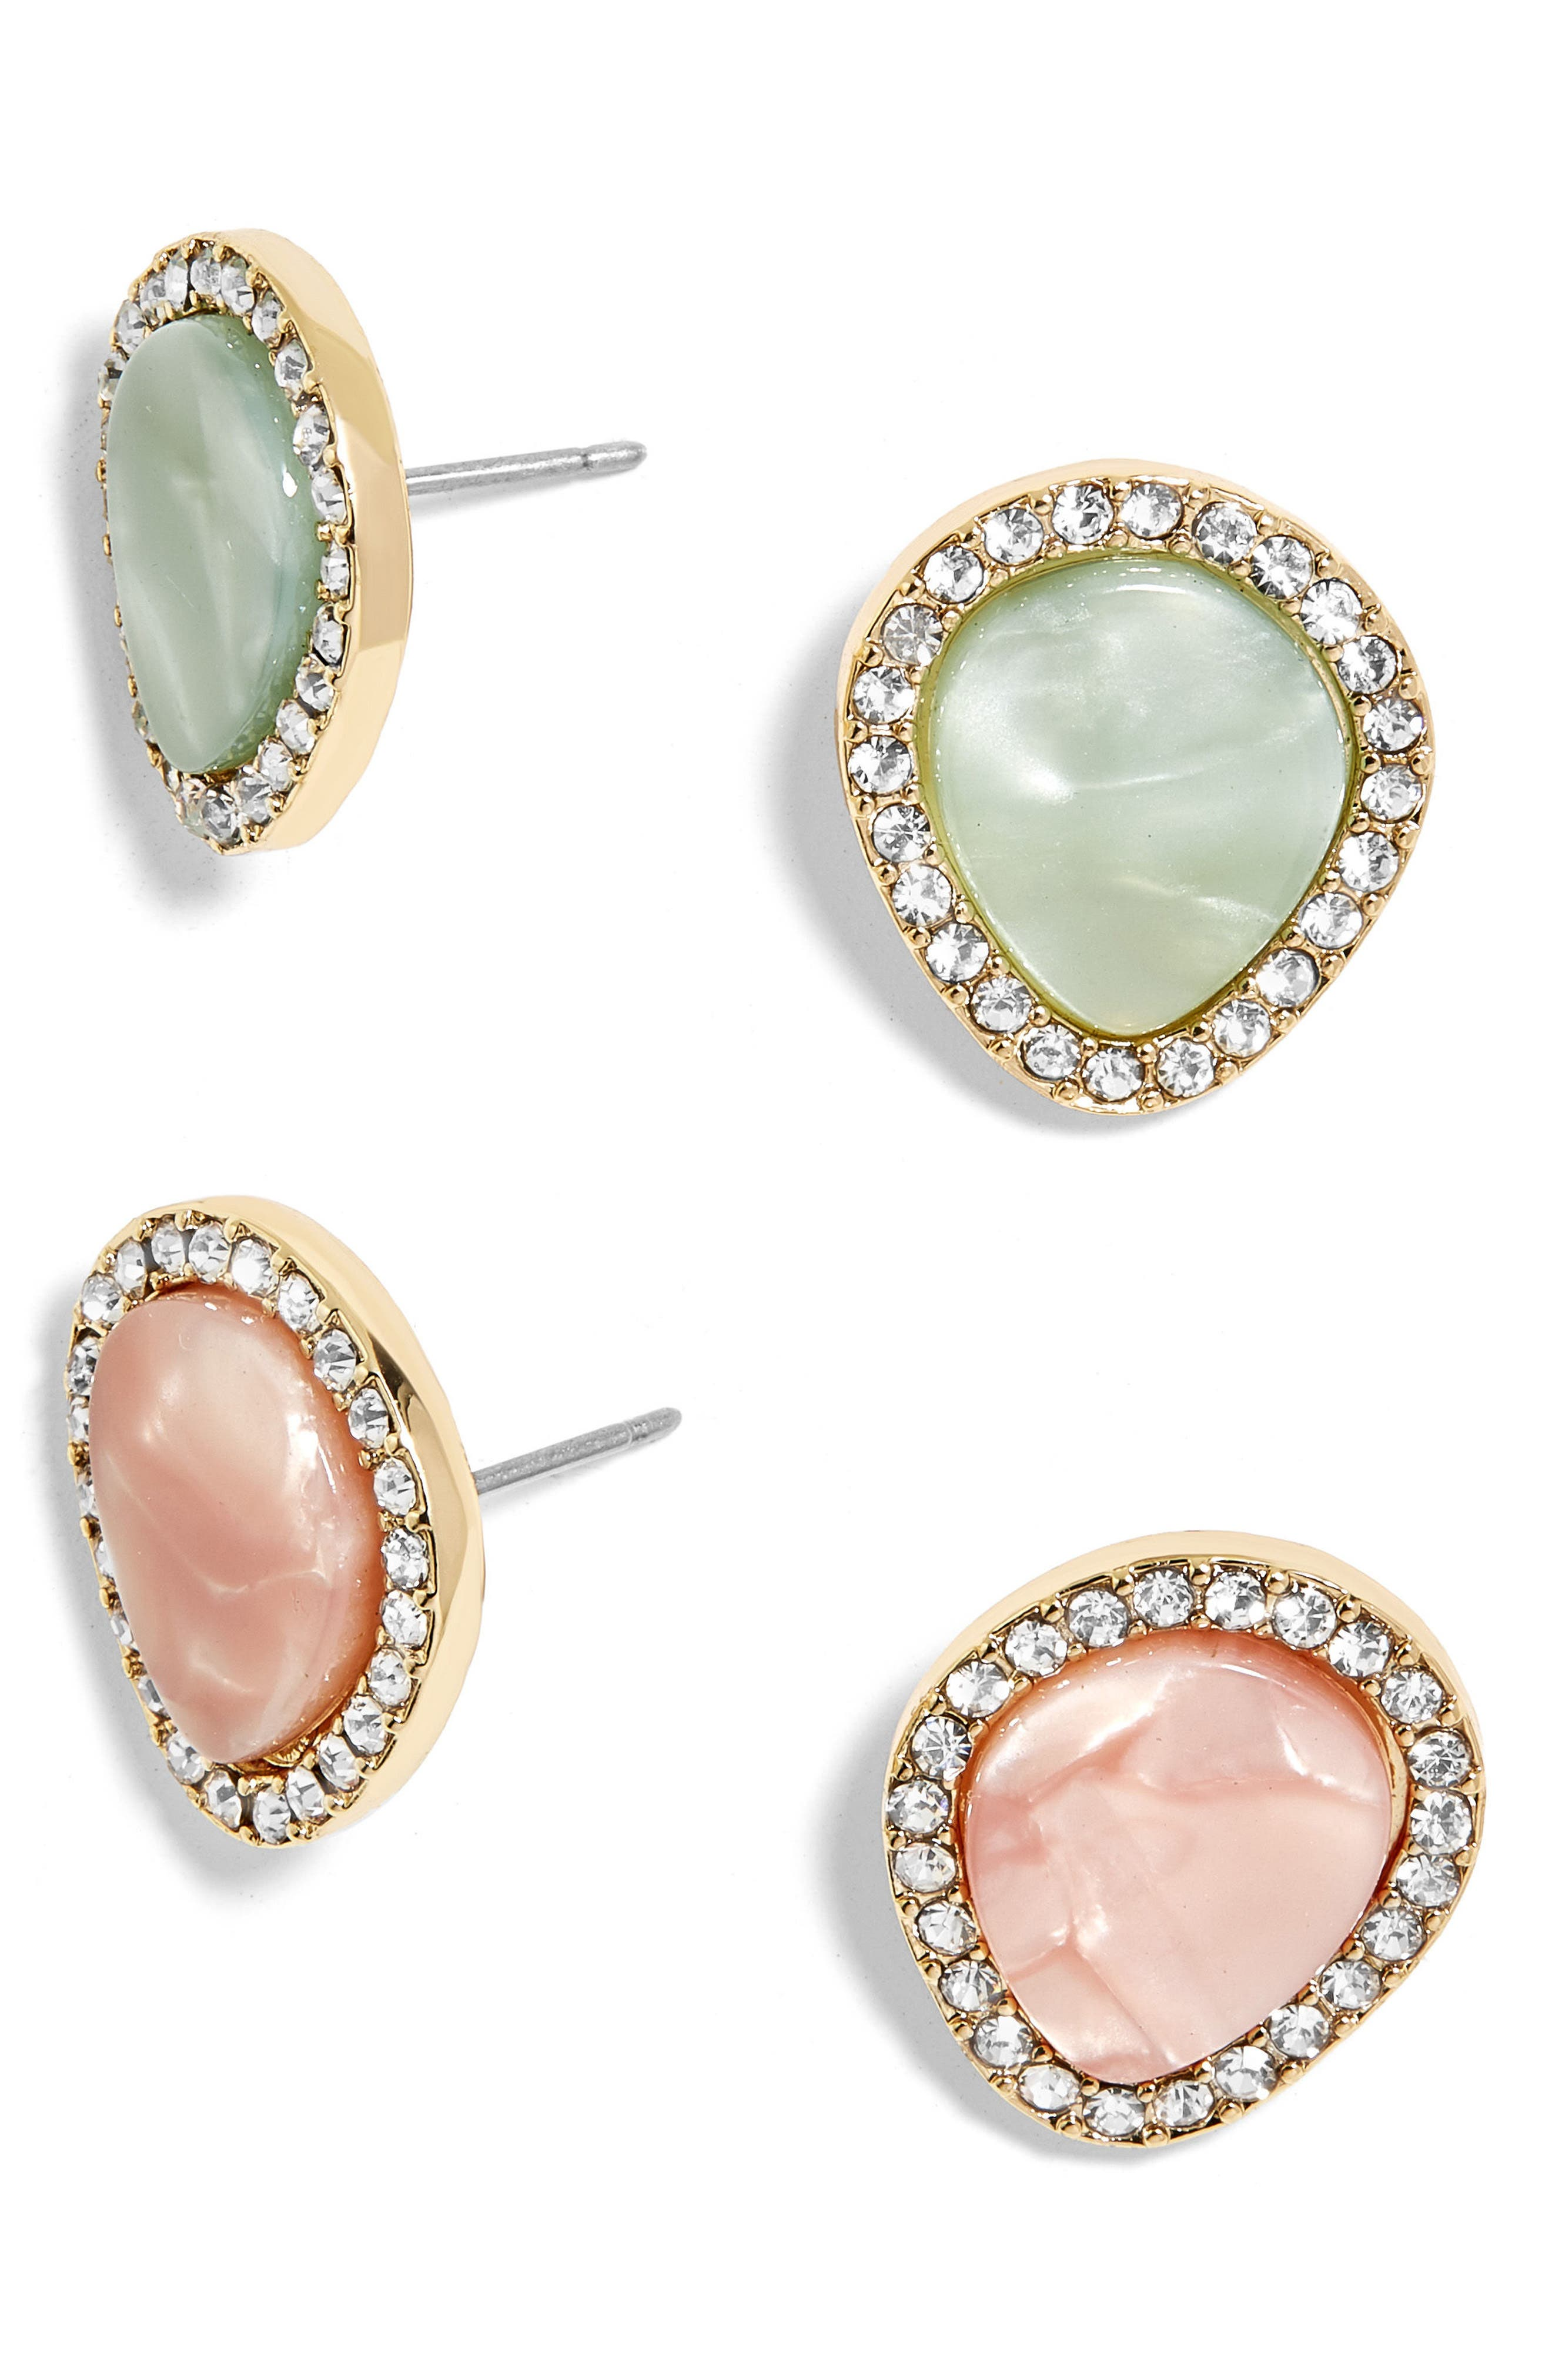 Set of 2 Crystal Encrusted Stud Earrings,                             Main thumbnail 1, color,                             042